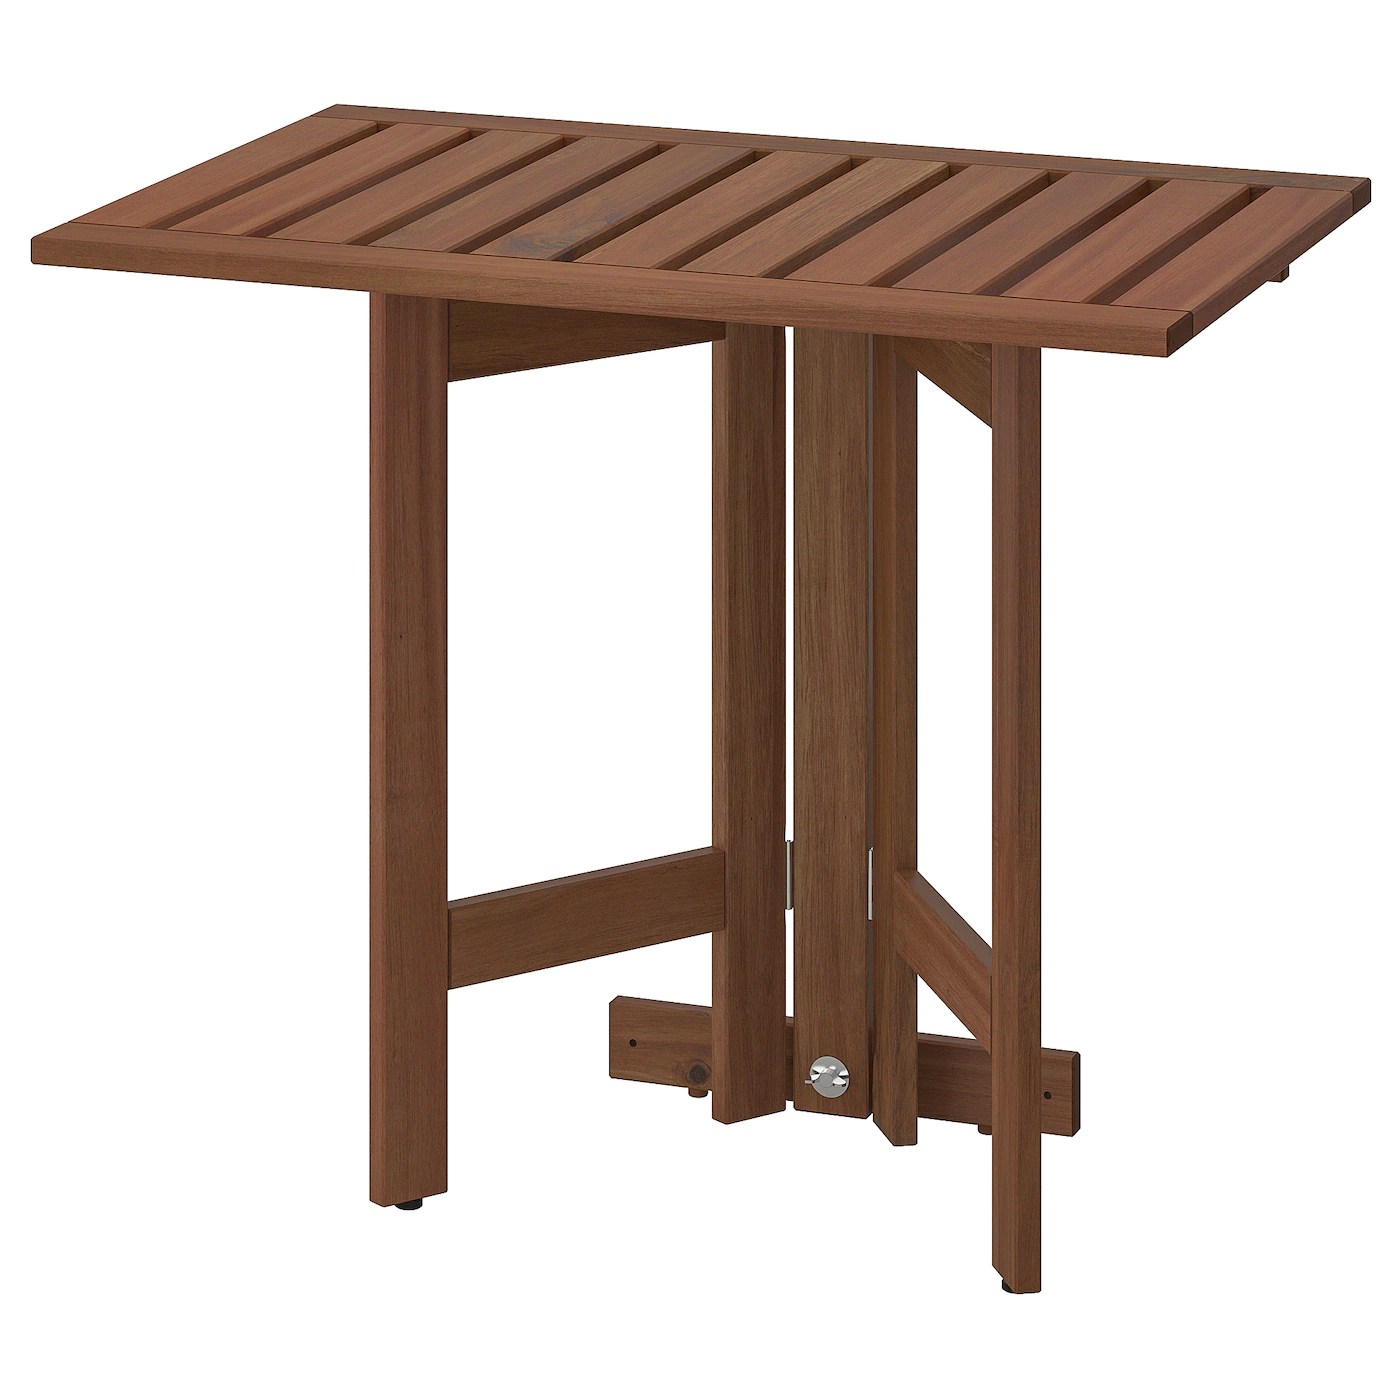 applaro table murale pliante exterieur teinte brun 80x56 cm